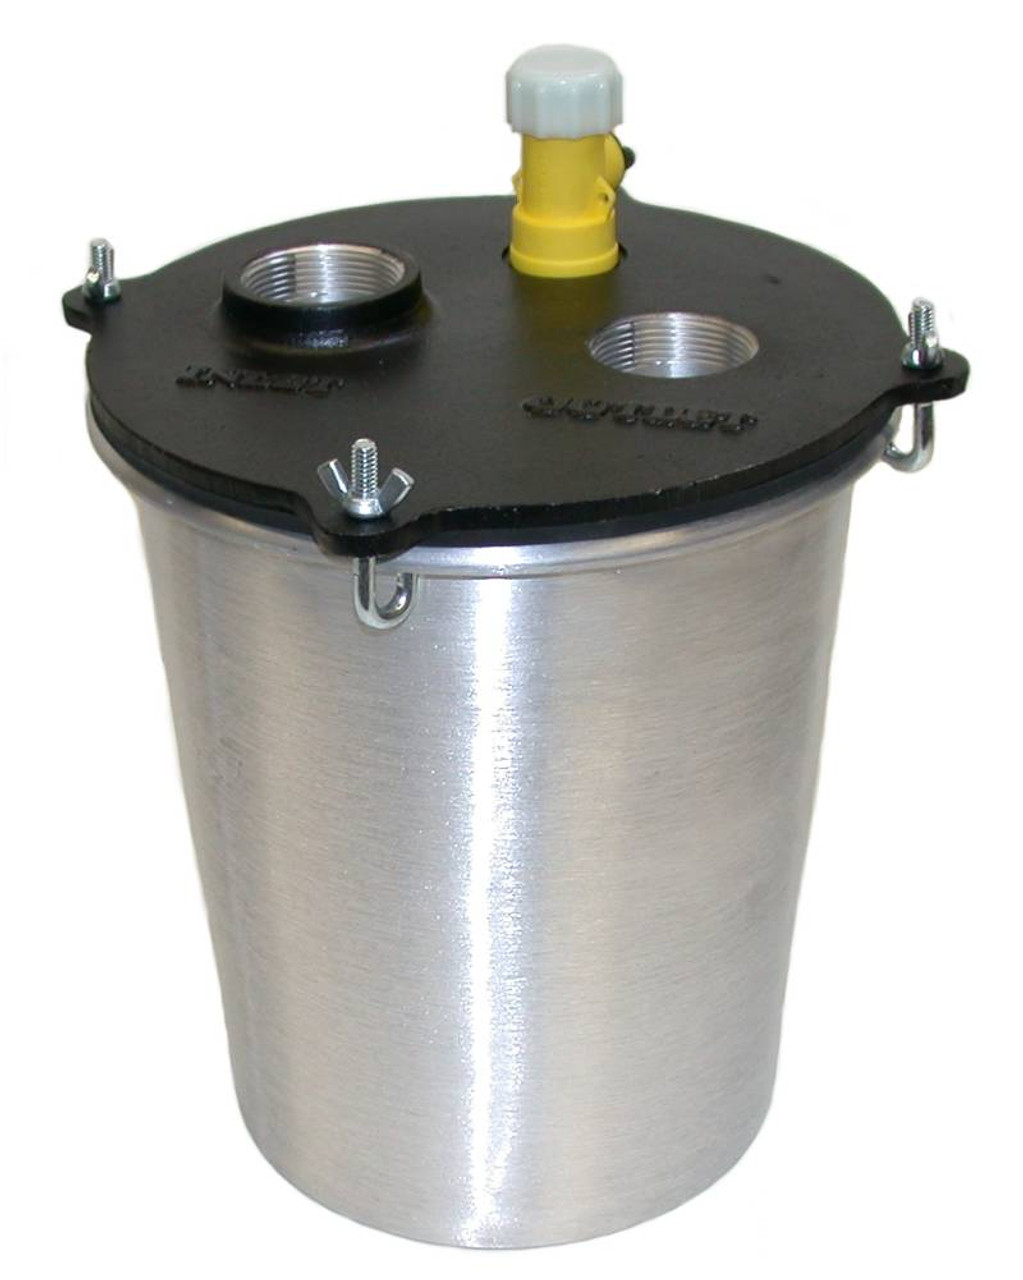 Aluminum Plaster Trap 2 1/2 Gallon